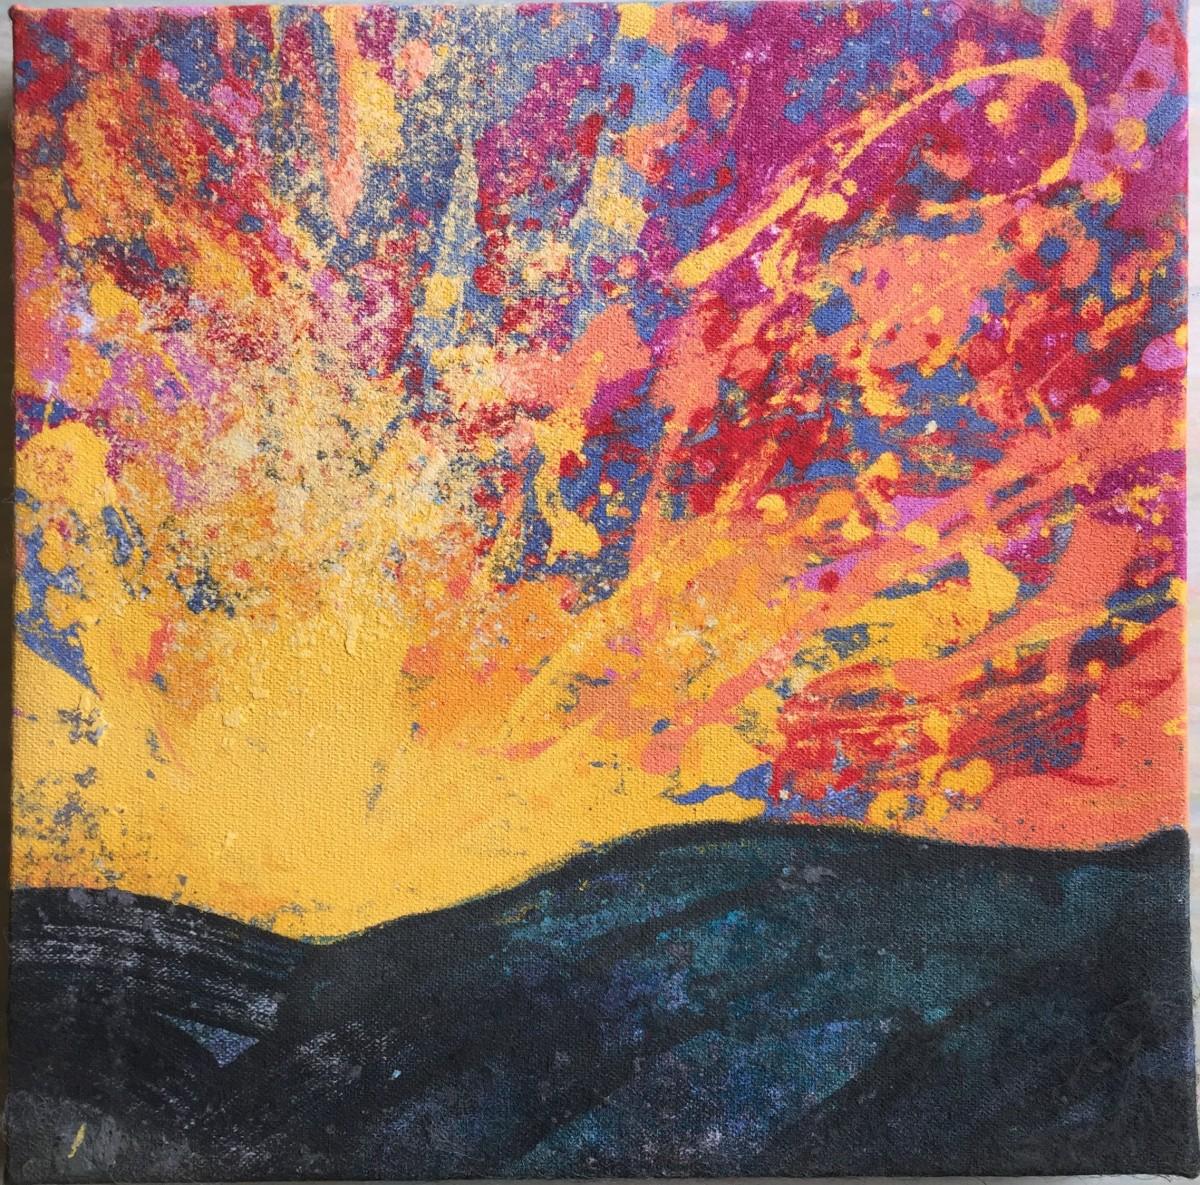 Sunset #1 by LZ Lerman